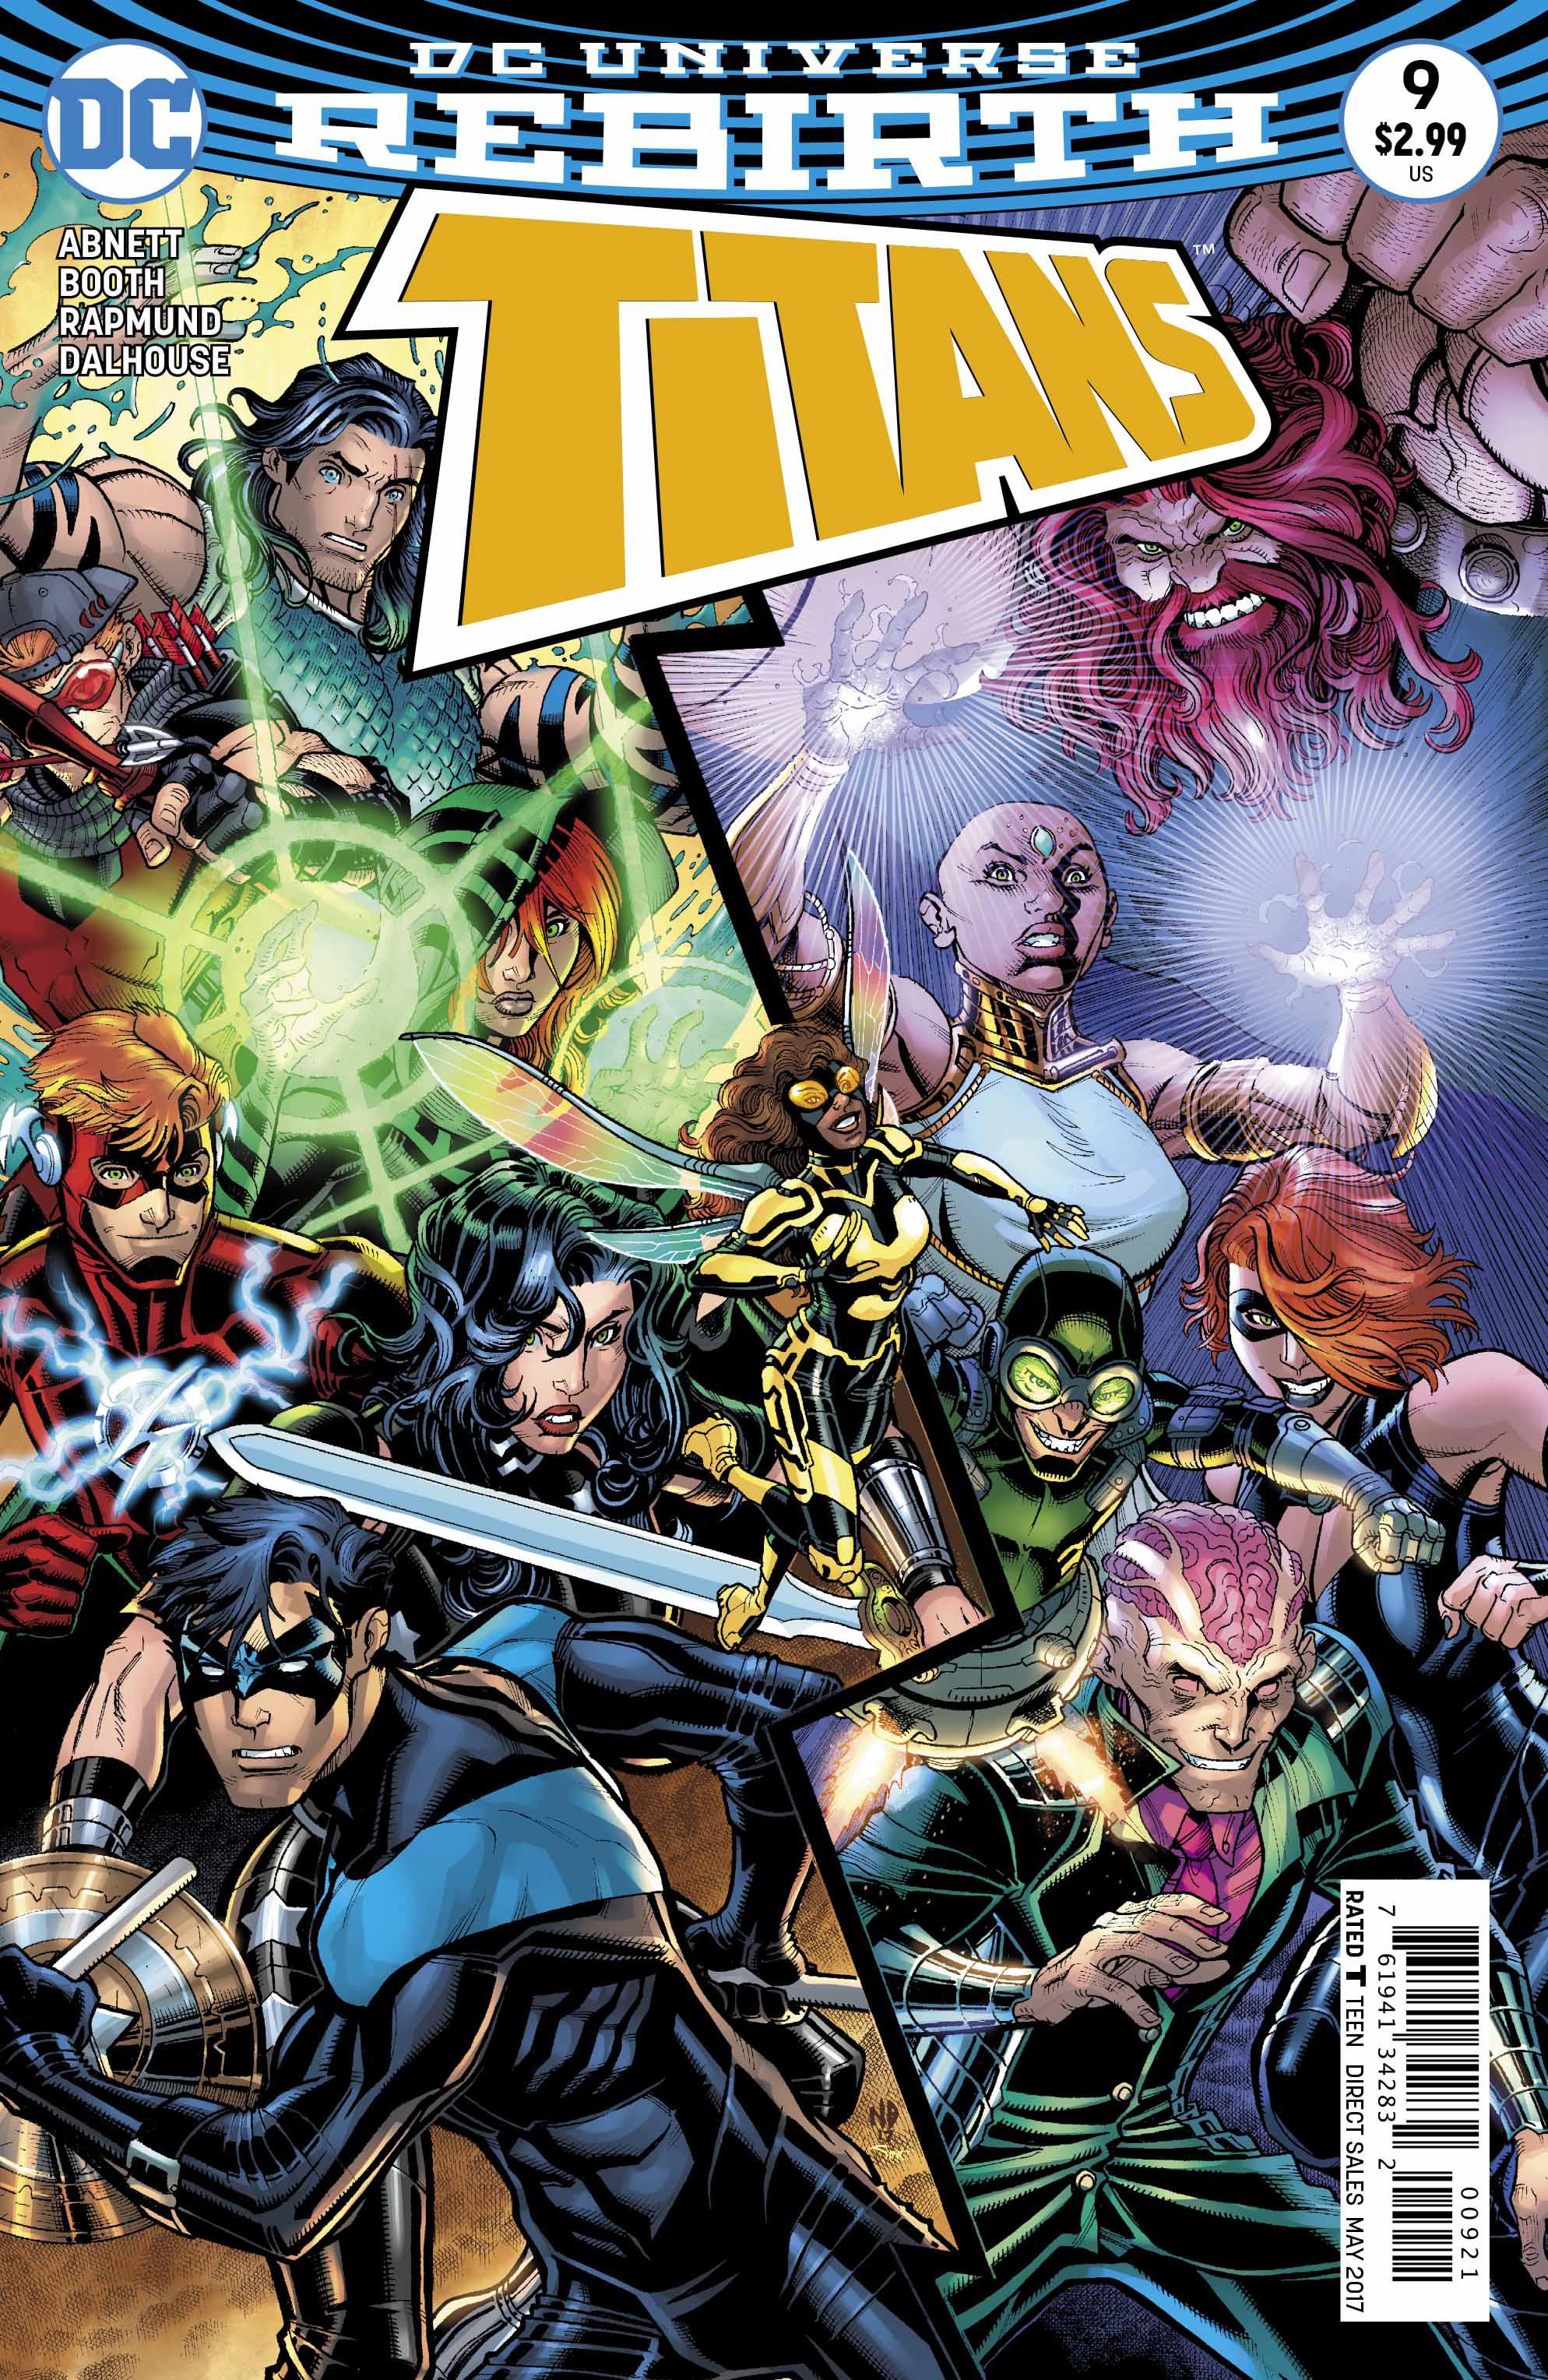 Titans #9 Var Ed